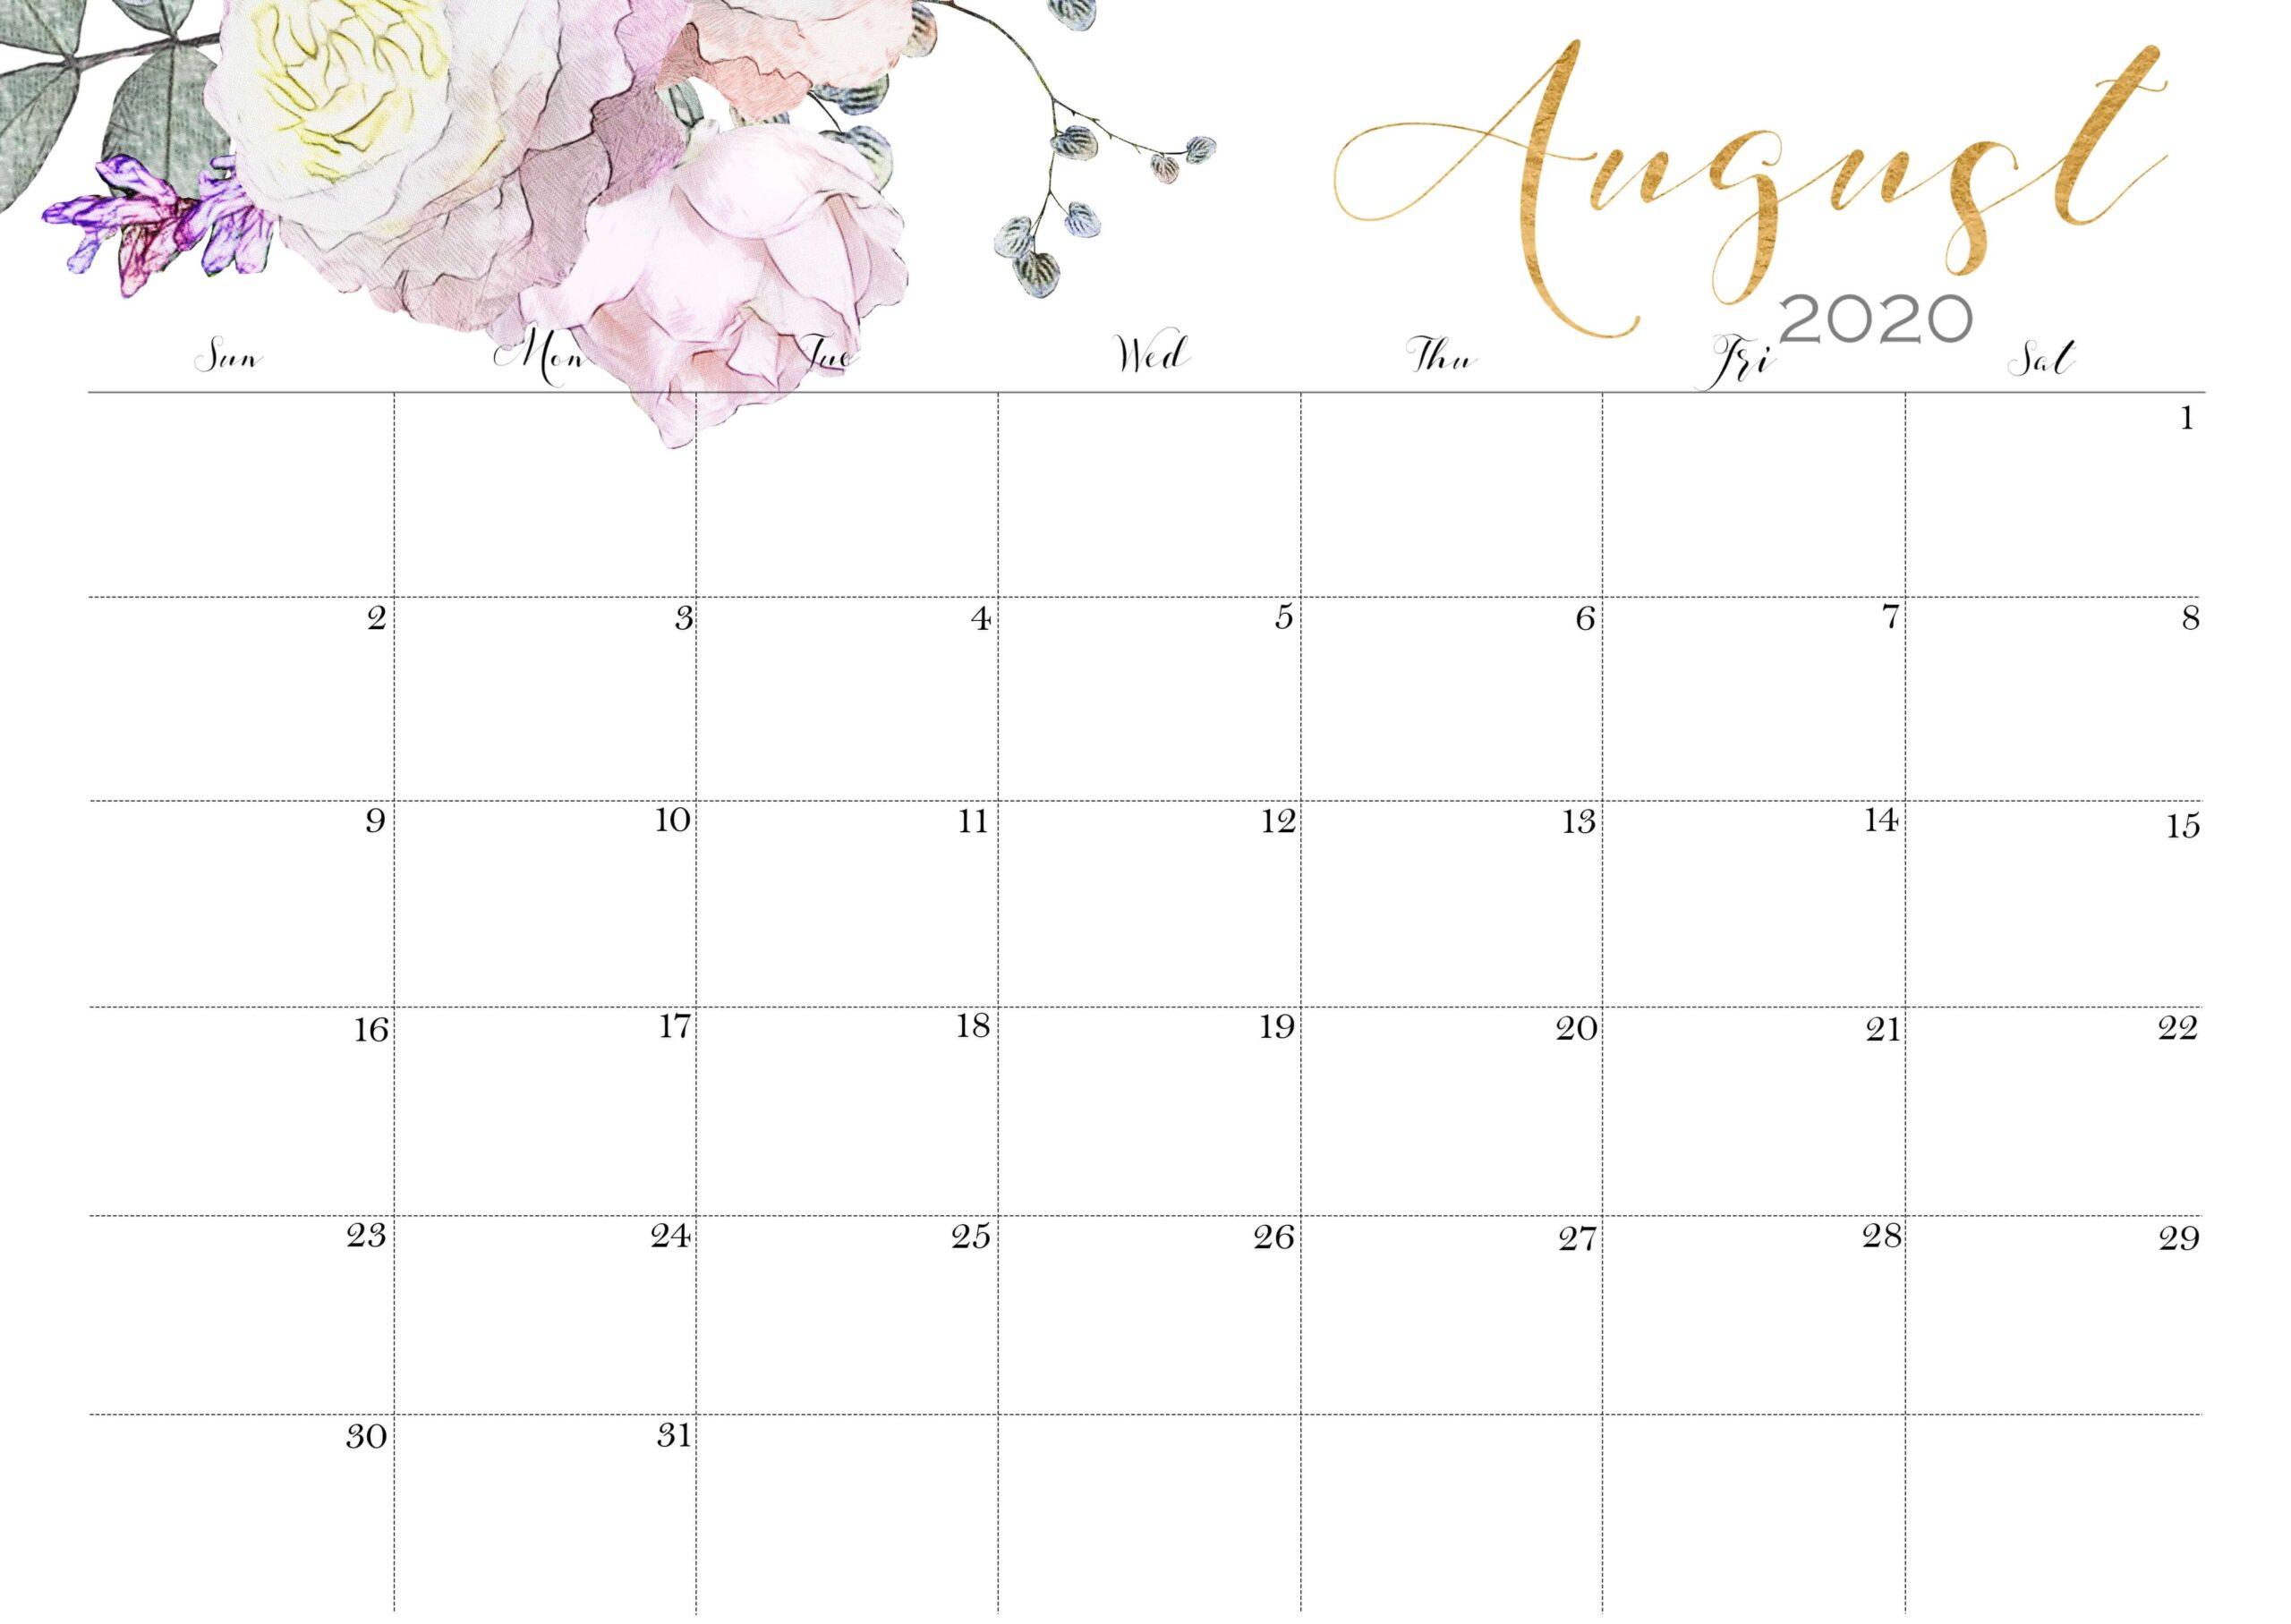 August Calendar 2020 With Holidays 1